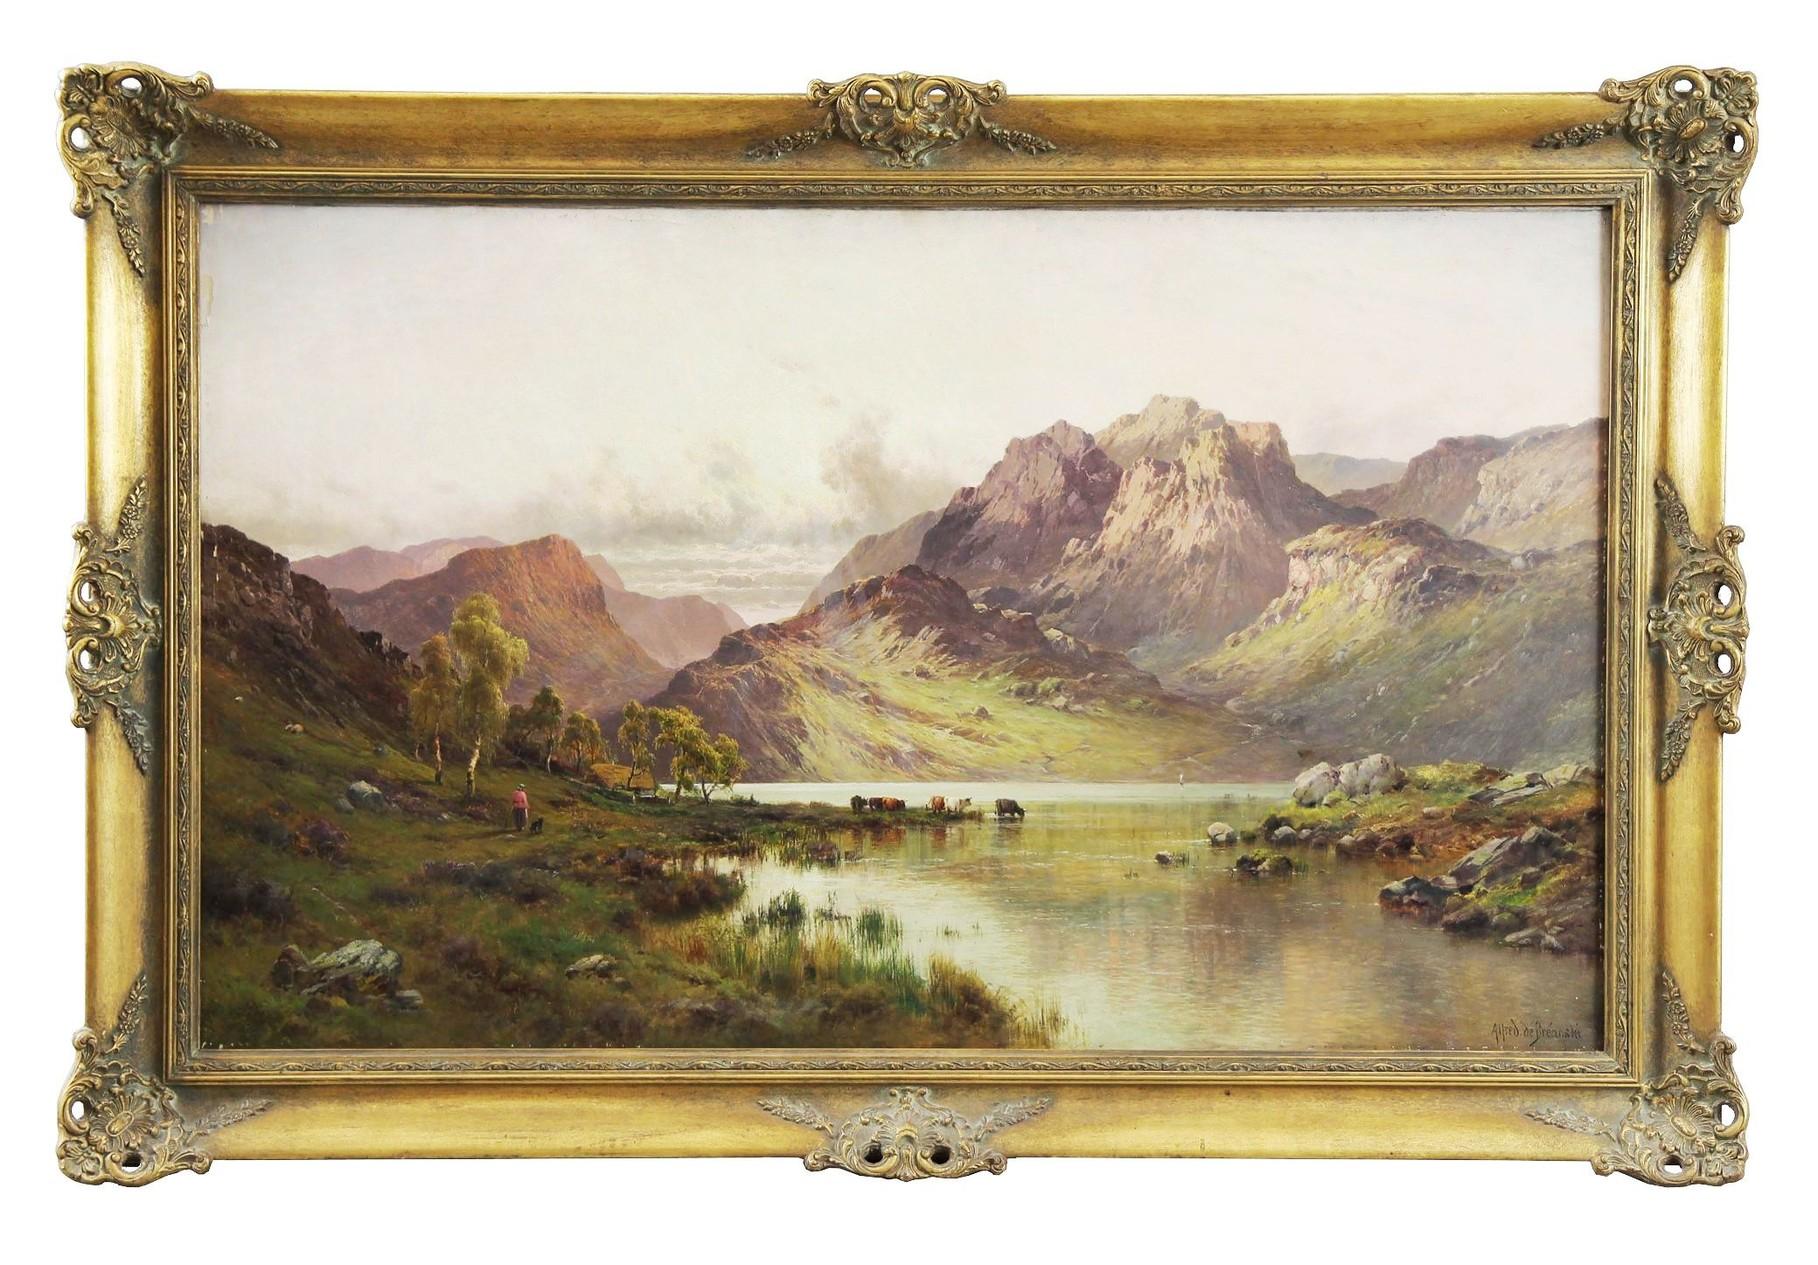 Alfred de Breanski, Auktionserlös 11.000 €